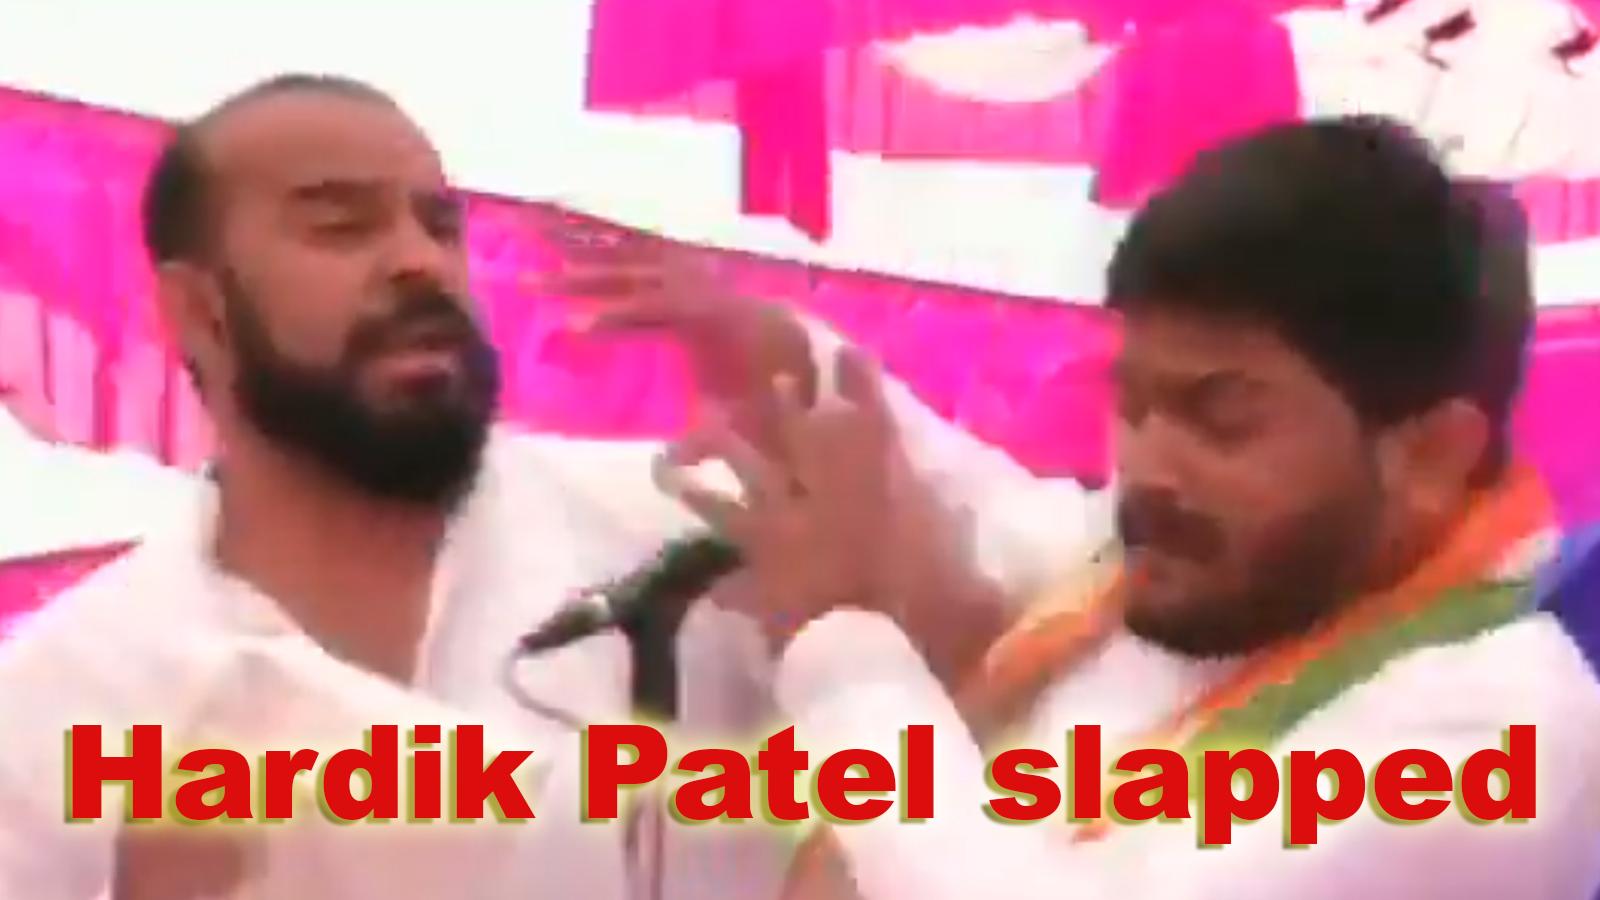 gujarat-congress-leader-hardik-patel-slapped-during-public-meeting-in-surendranagar